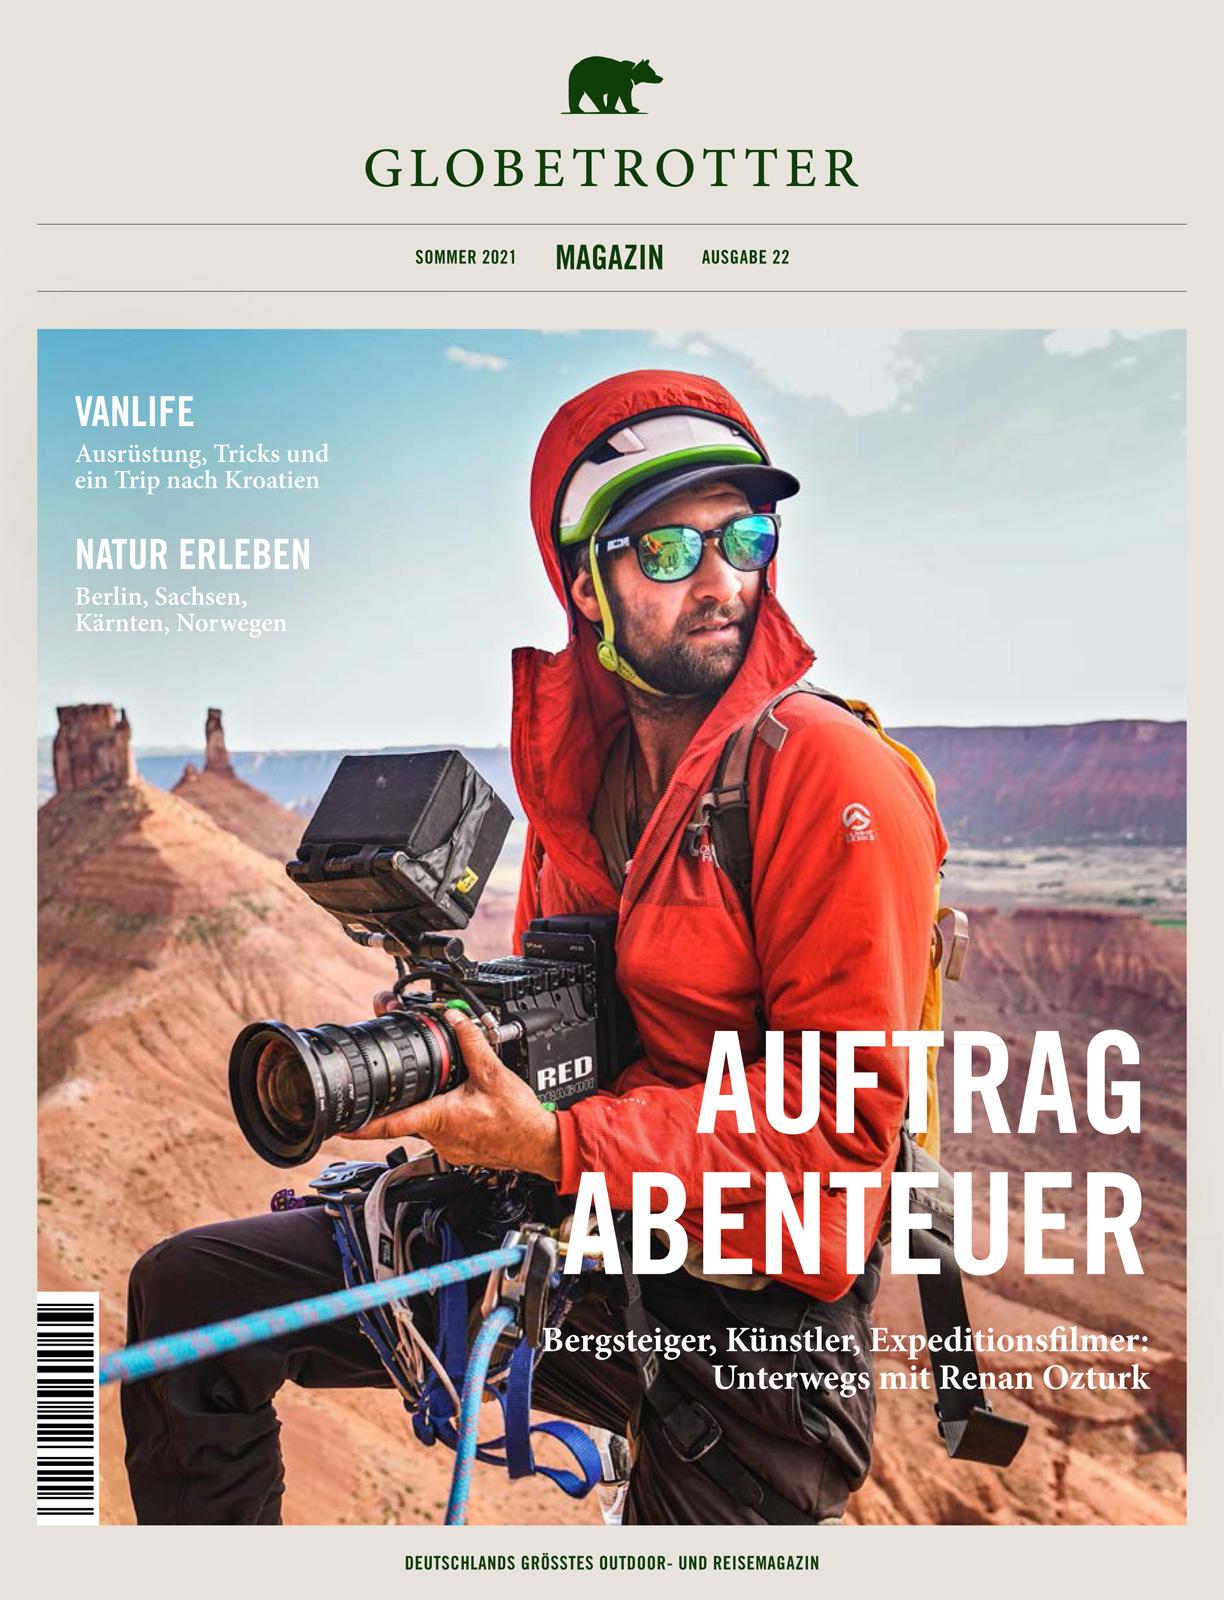 Cover Globetrotter Magazin Sommer 2021 (Renan Ozturk)